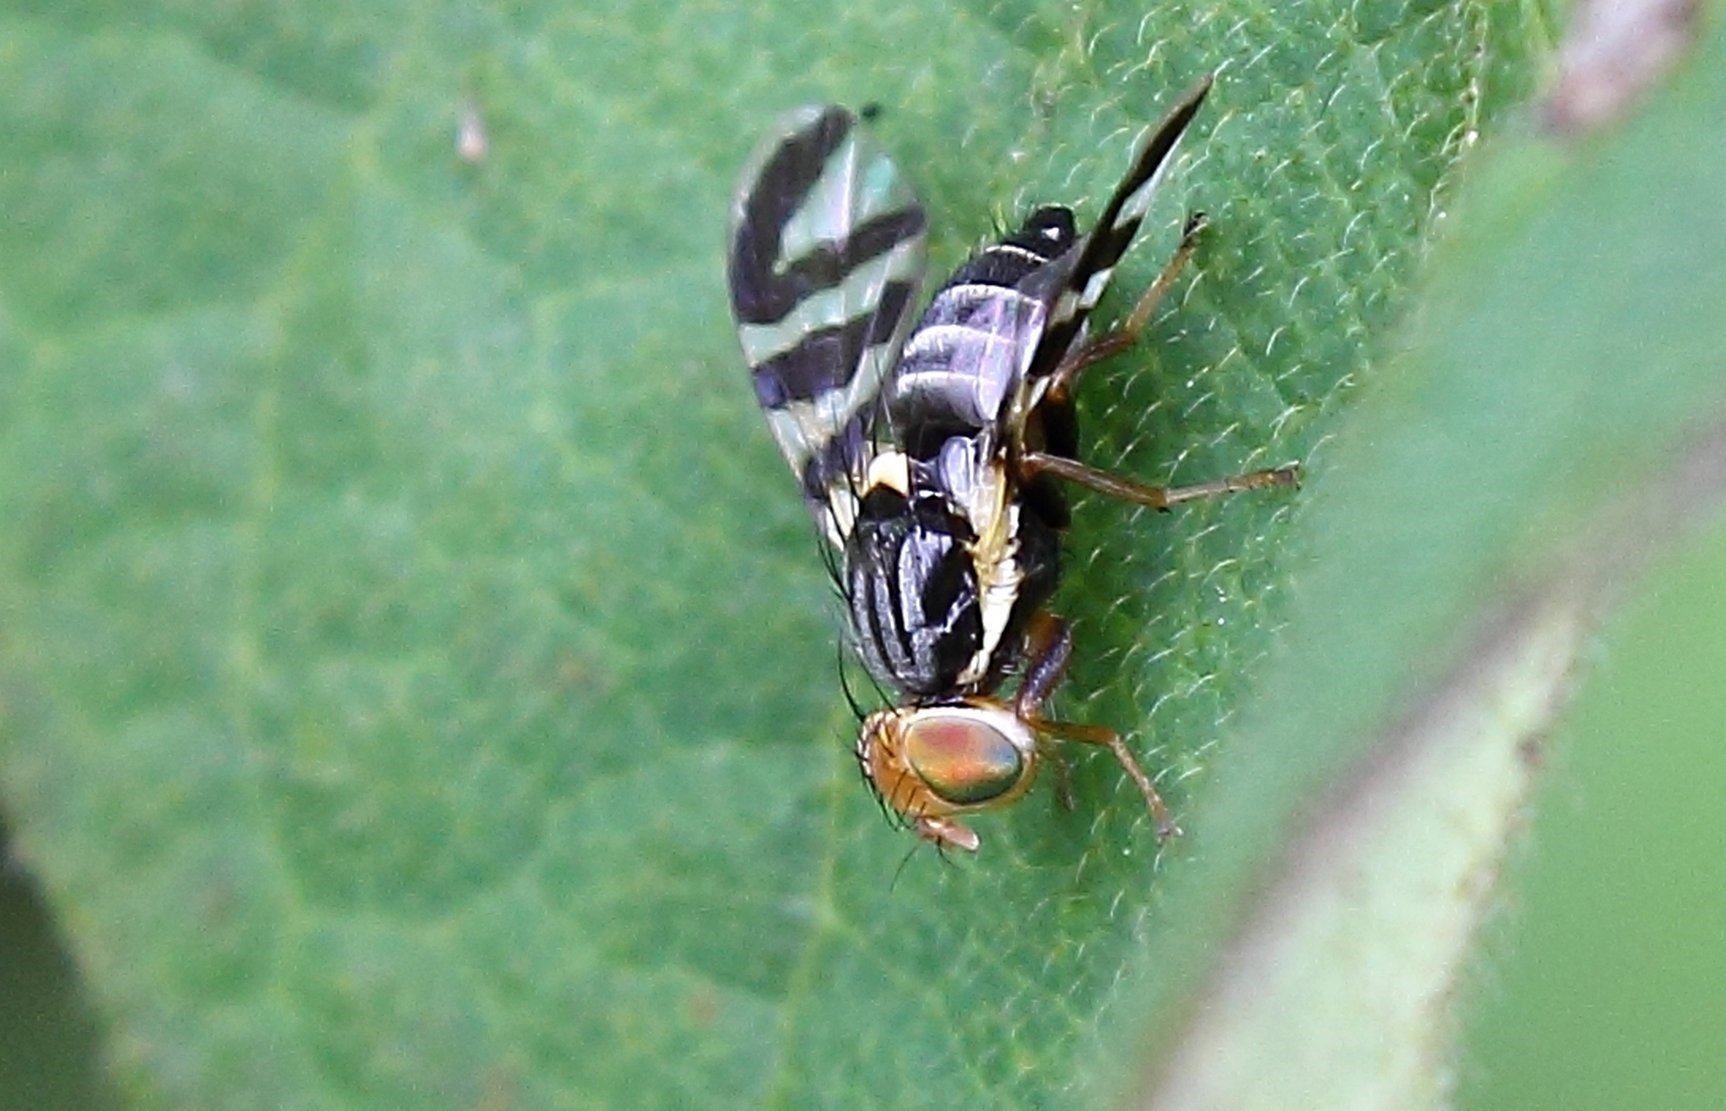 Havtornflue (Rhagoletis batava)